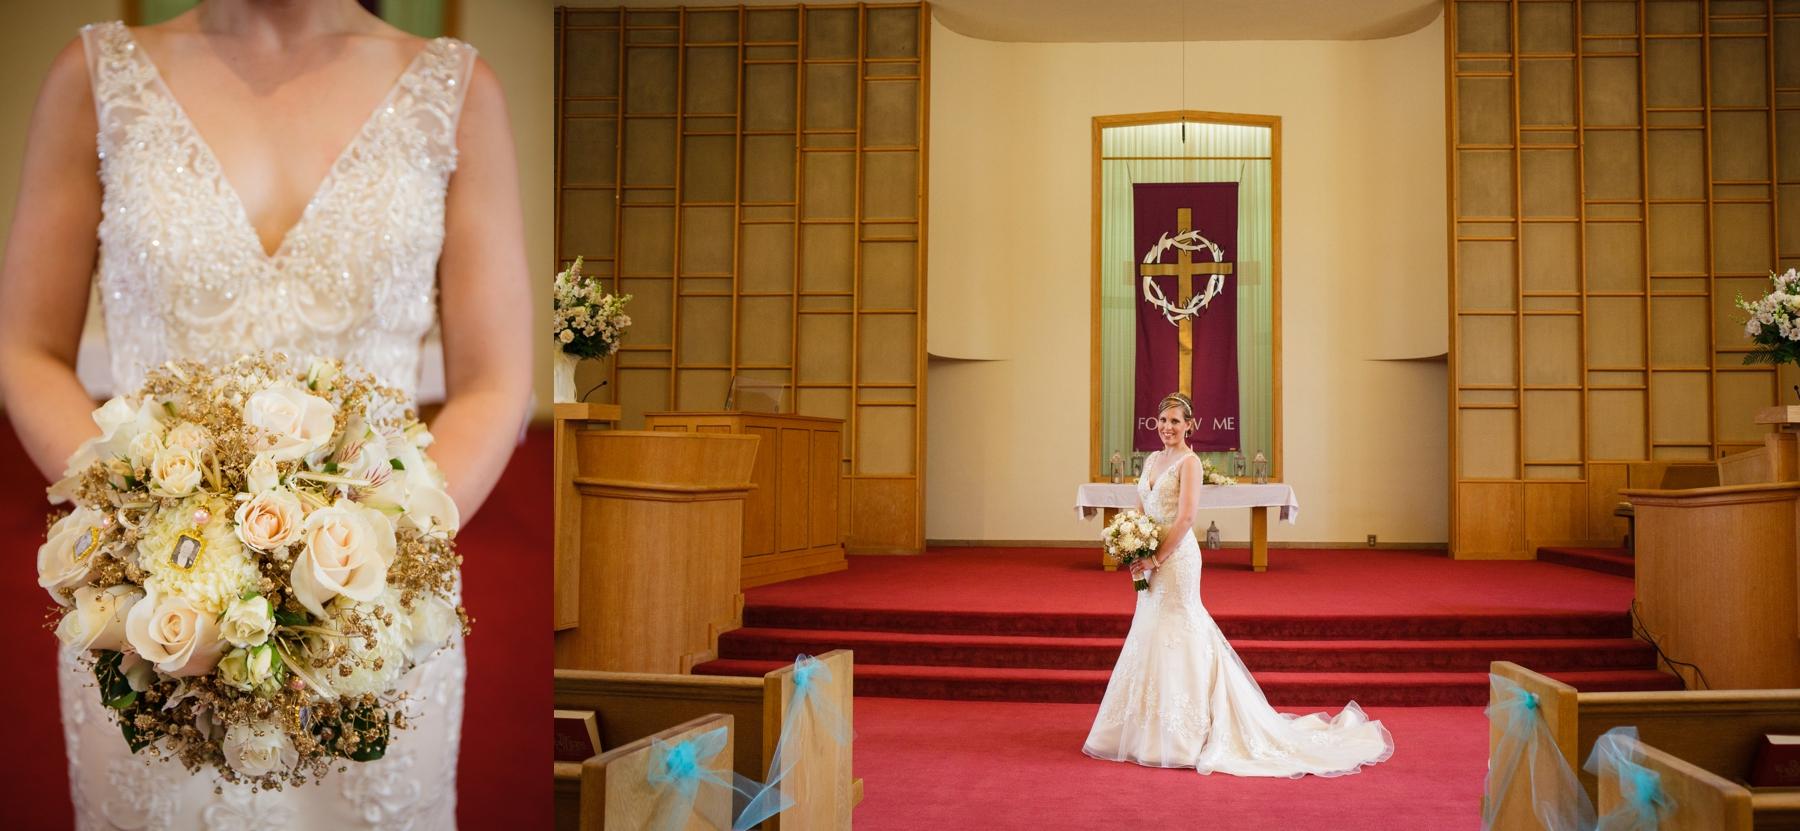 Ben_Jillian_Midland_Baycity_Wedding_0029.jpg